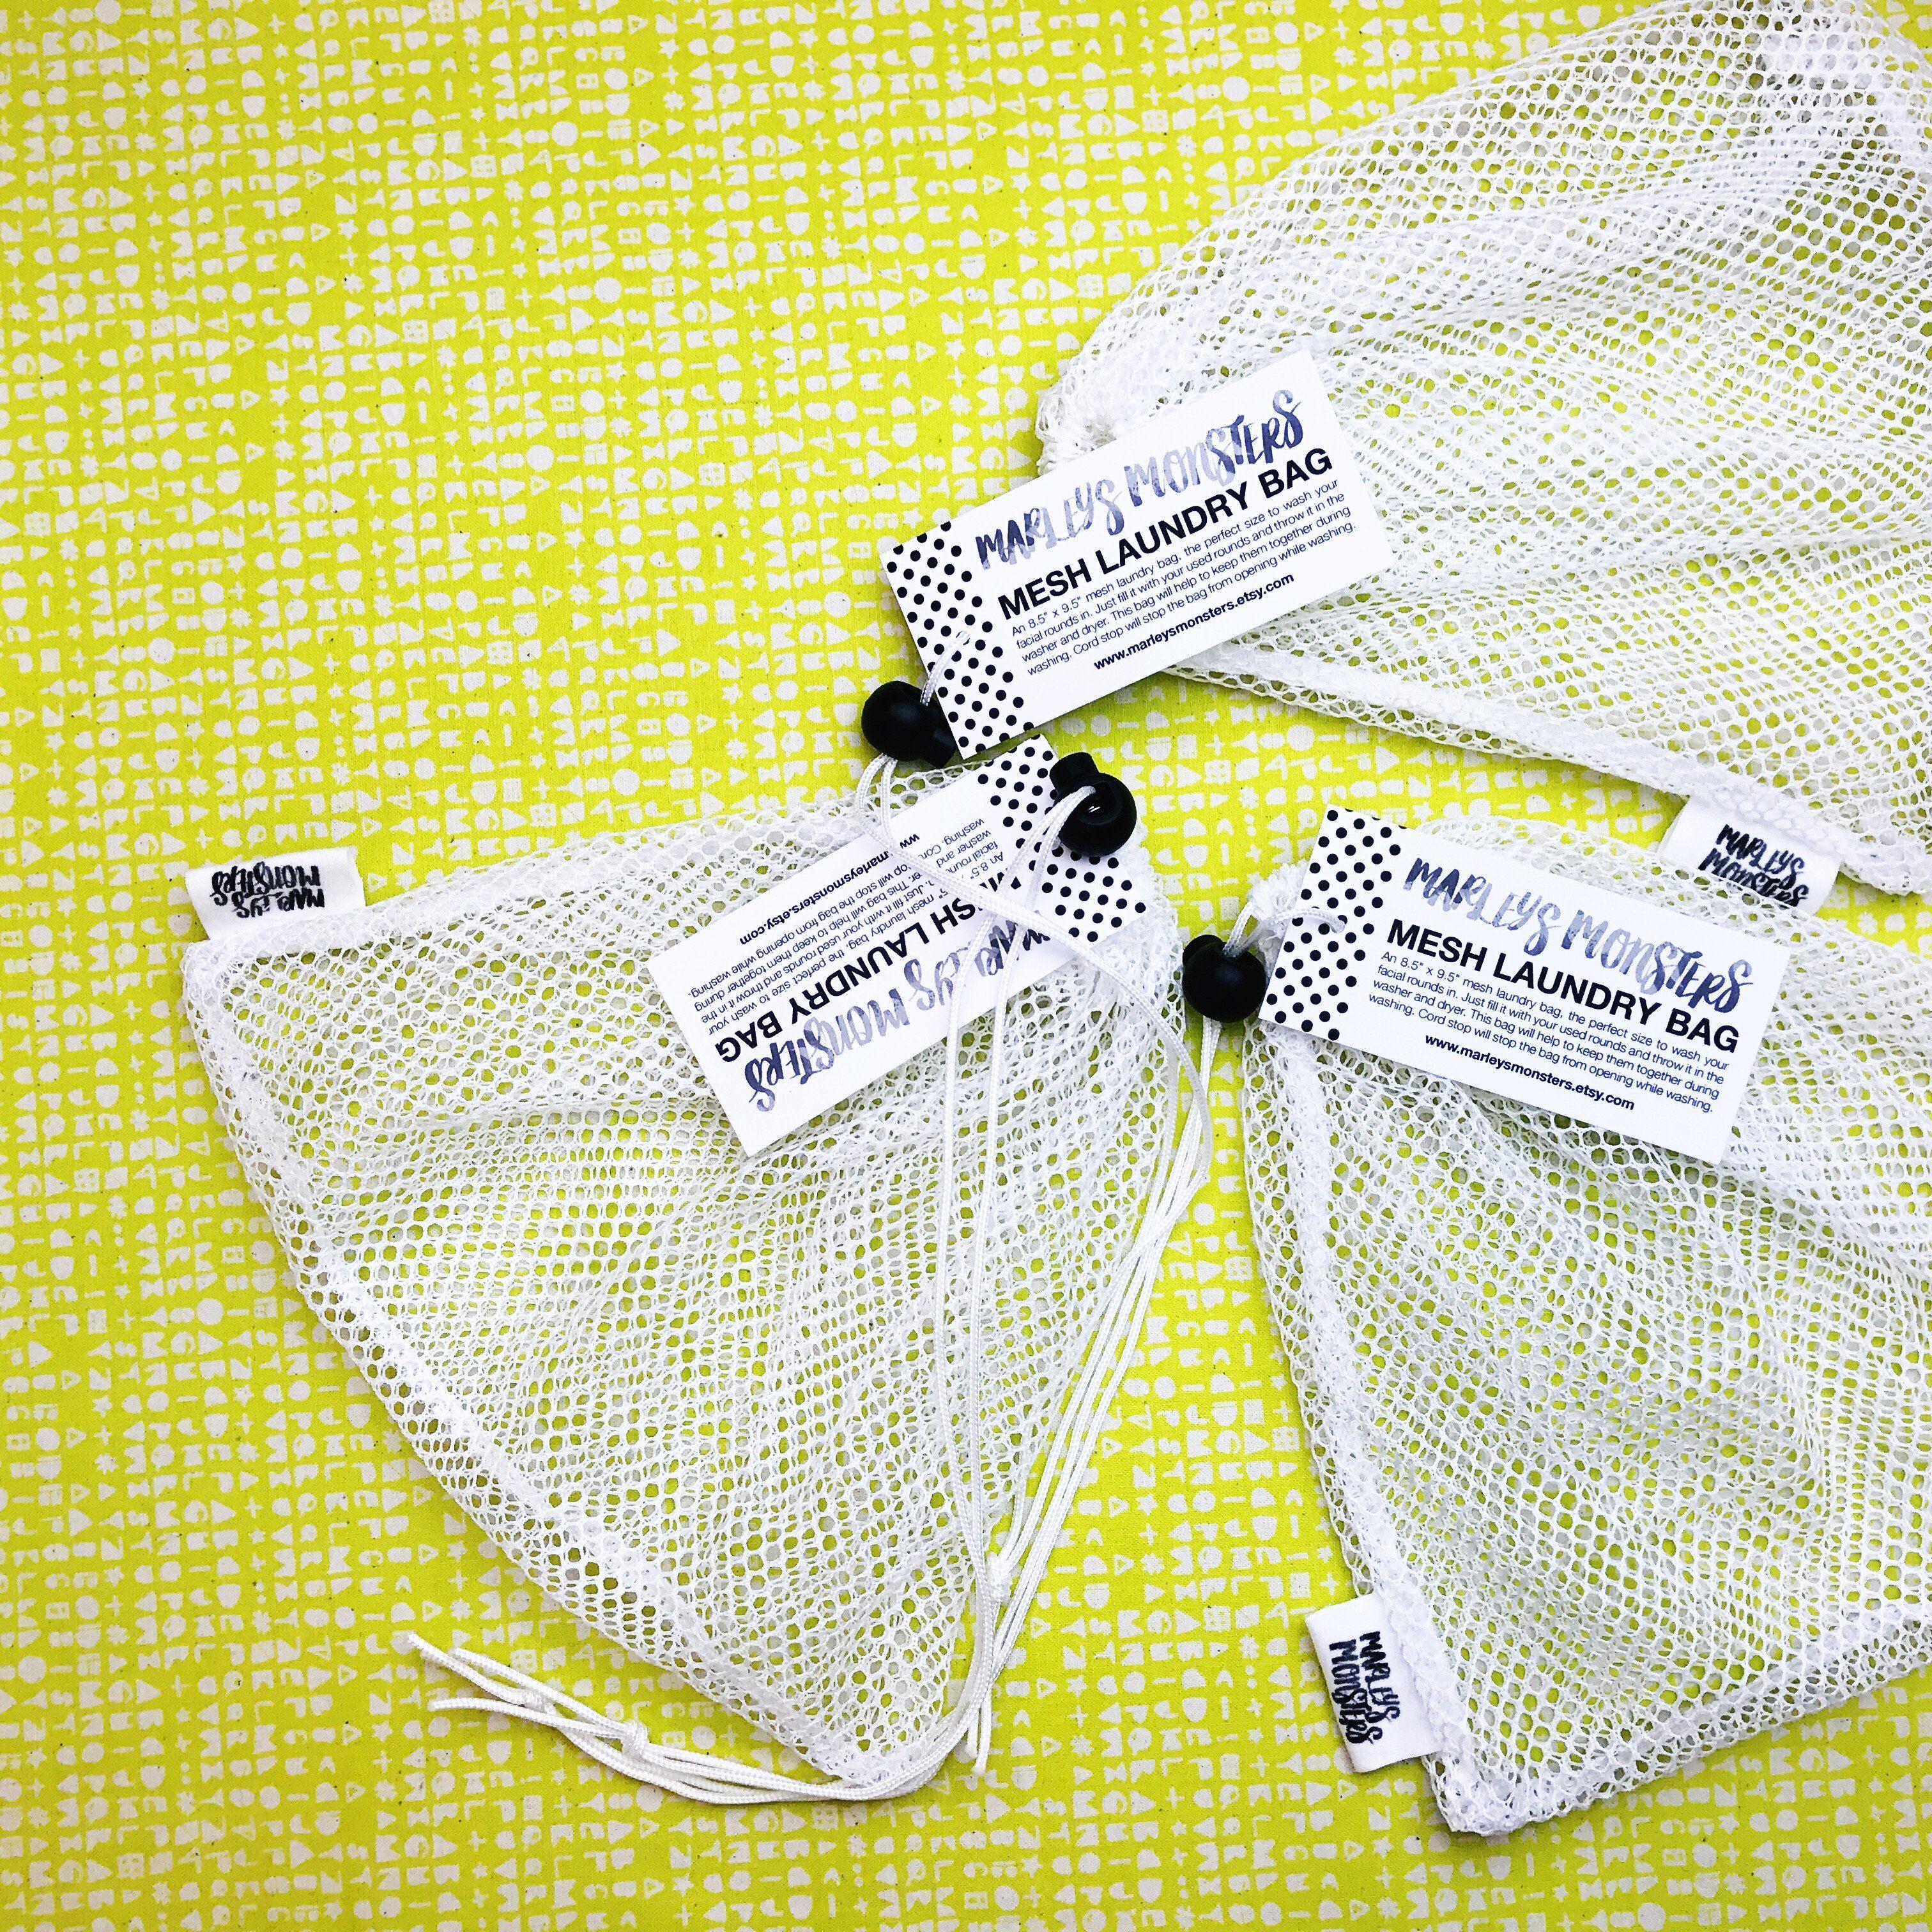 Mesh Laundry Bag Mesh Laundry Bags Nursing Pads Baby Socks